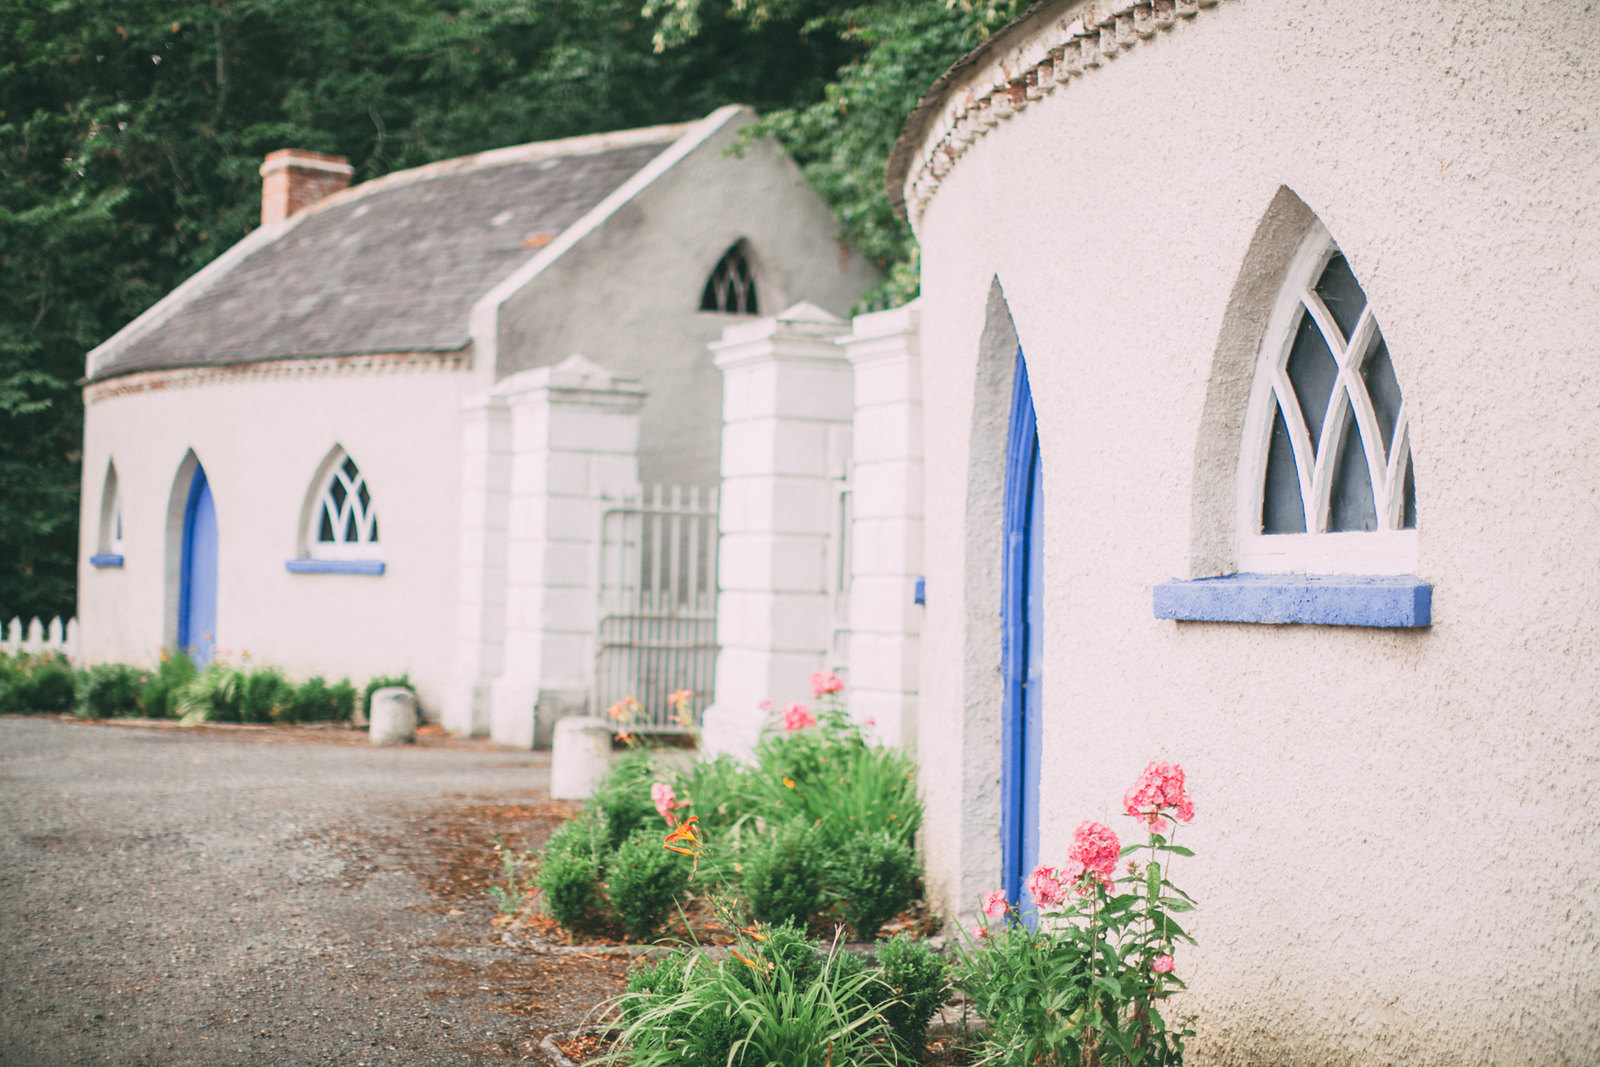 summerisland gatehouses-13